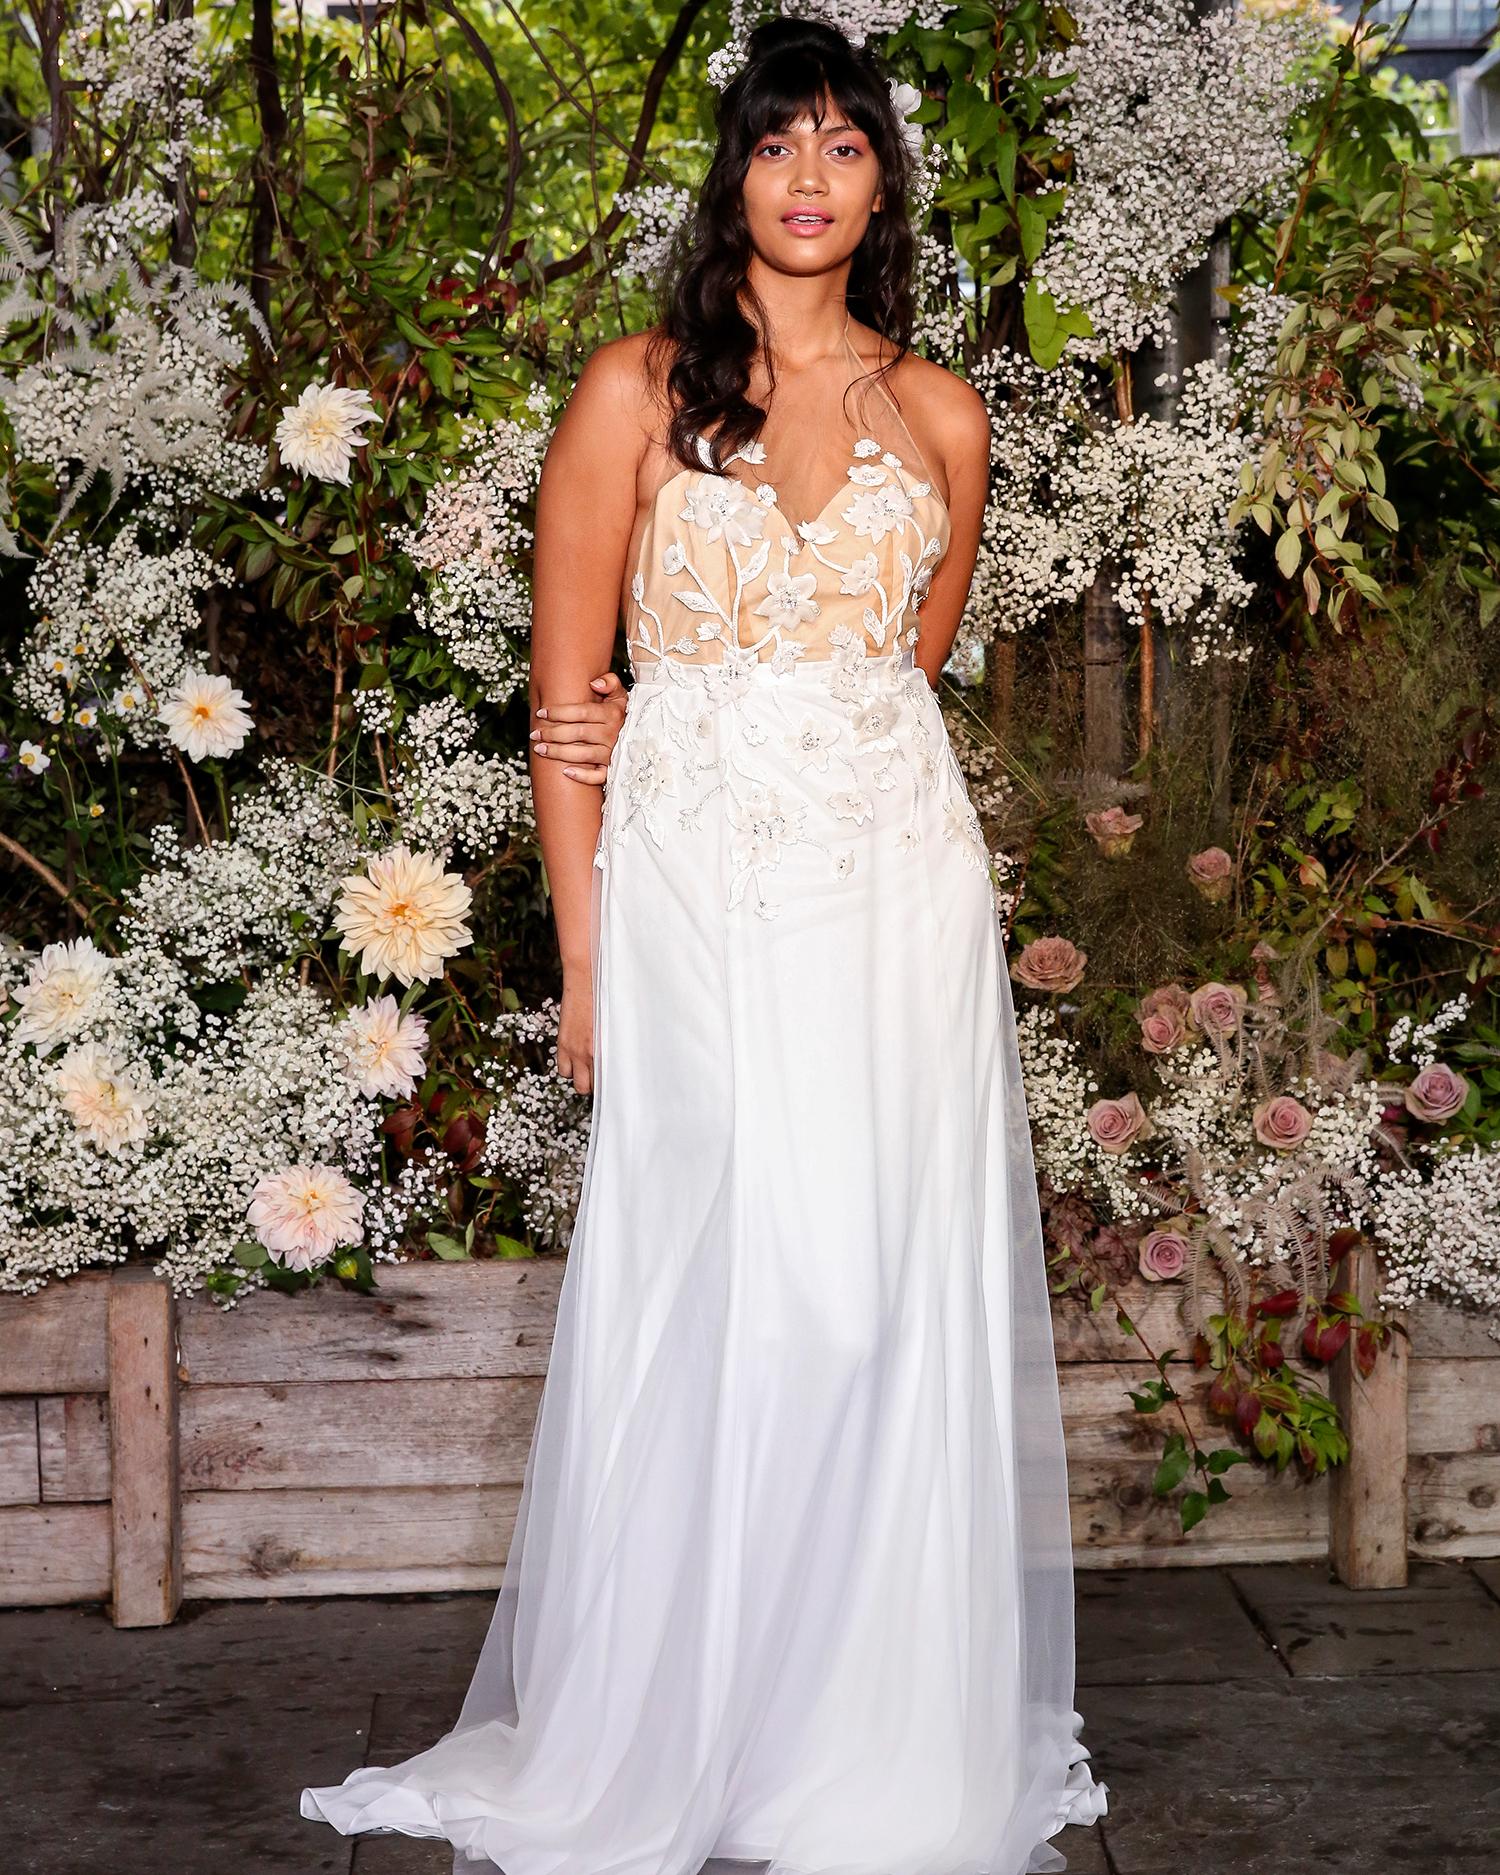 alexandra grecco wedding dress two-toned embellished overlay